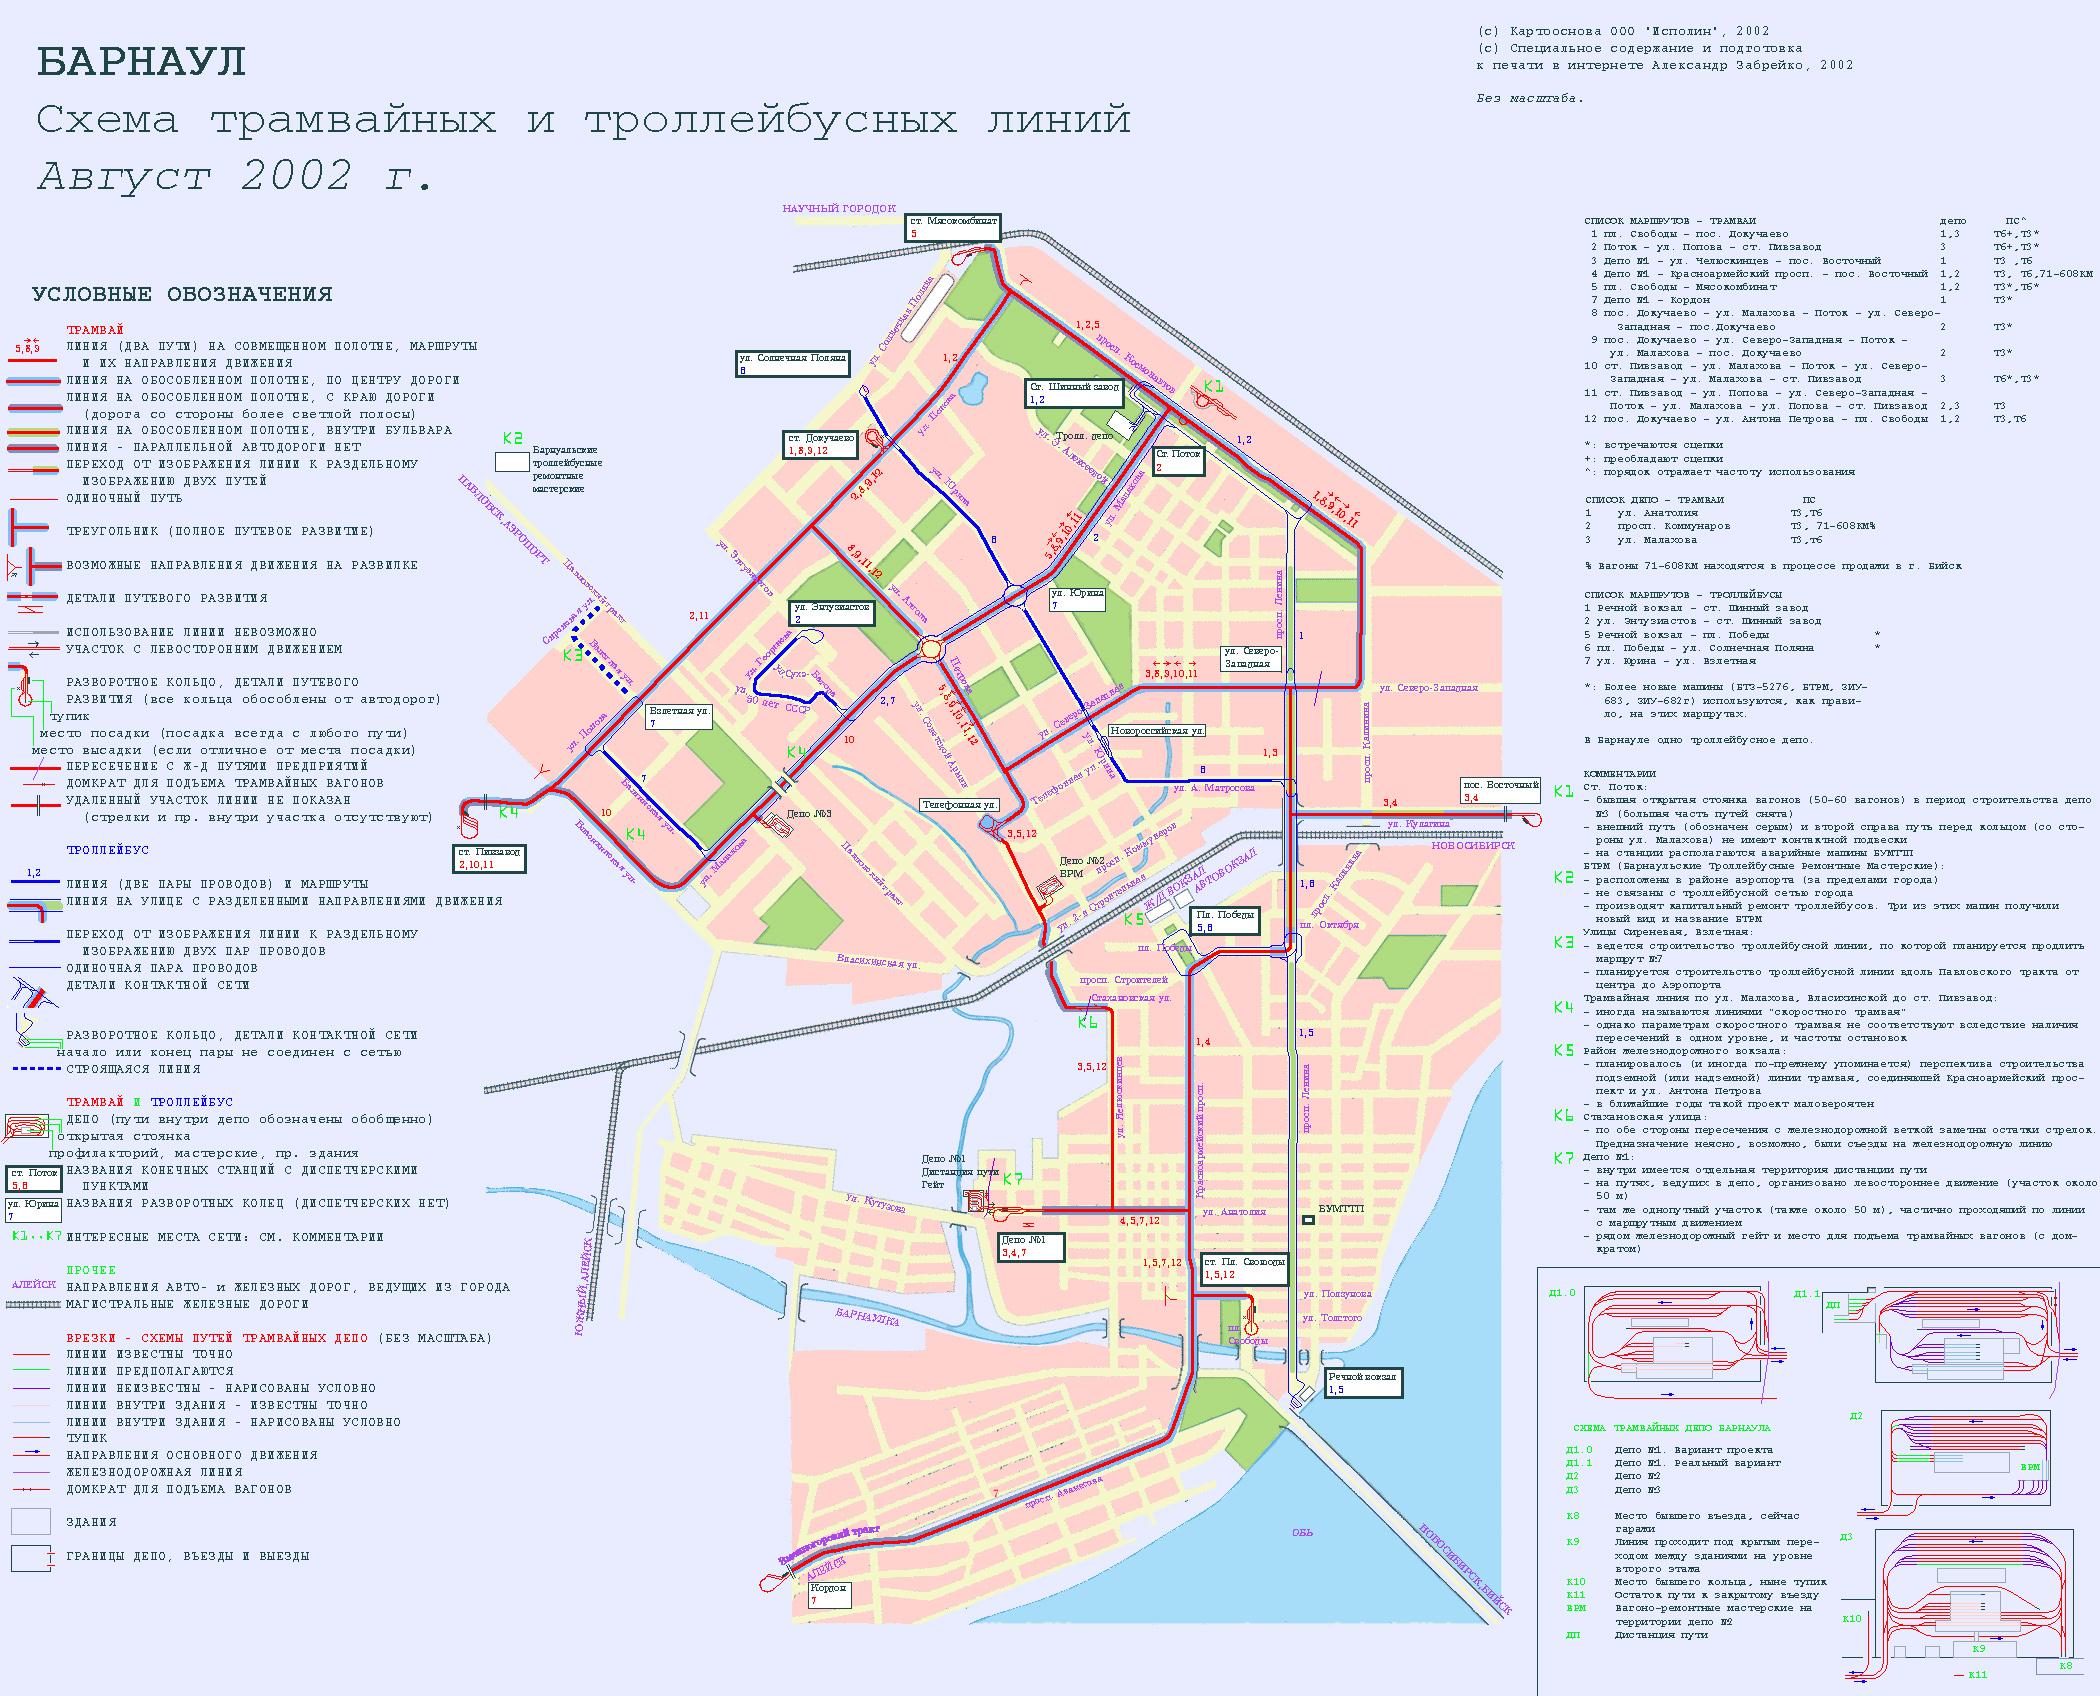 Карта-схема трамвайных и троллейбусных маршрутов Барнаула ...: http://raster-maps.com/?p=4830